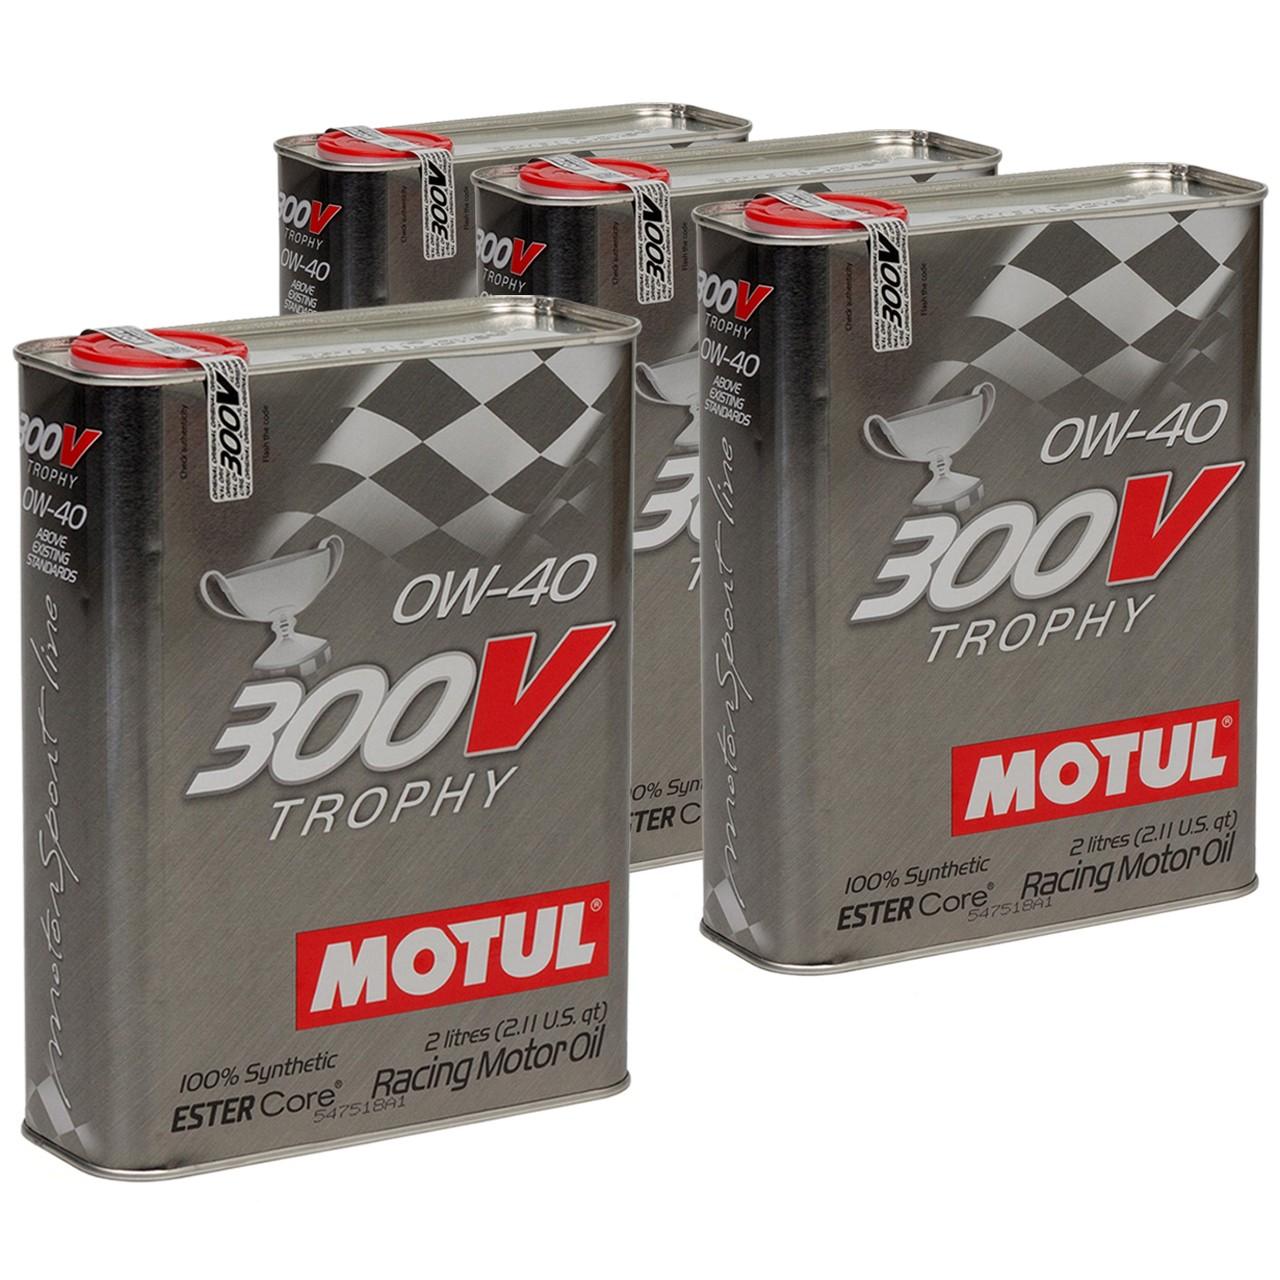 MOTUL 300V TROPHY RACING Motoröl Öl 0W40 100% Synthetic Ester Core - 8L 8 Liter